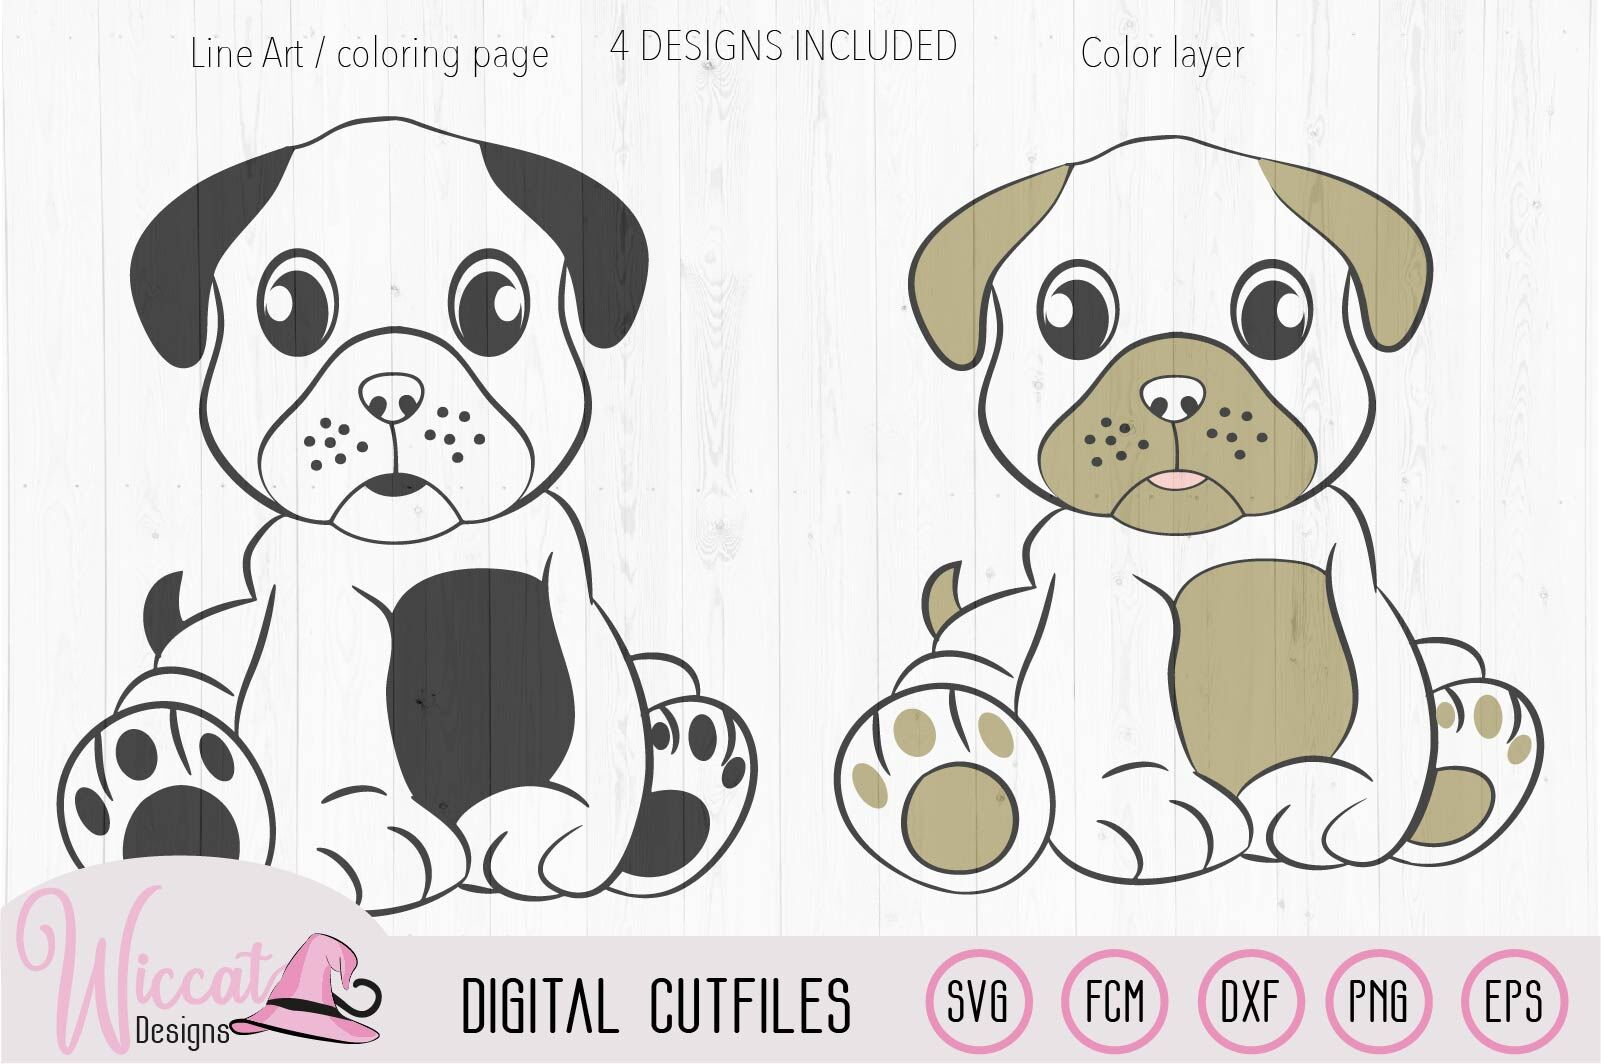 Girl Dog Pug Svg Boy Dog Pug By Wiccatdesigns Thehungryjpeg Com